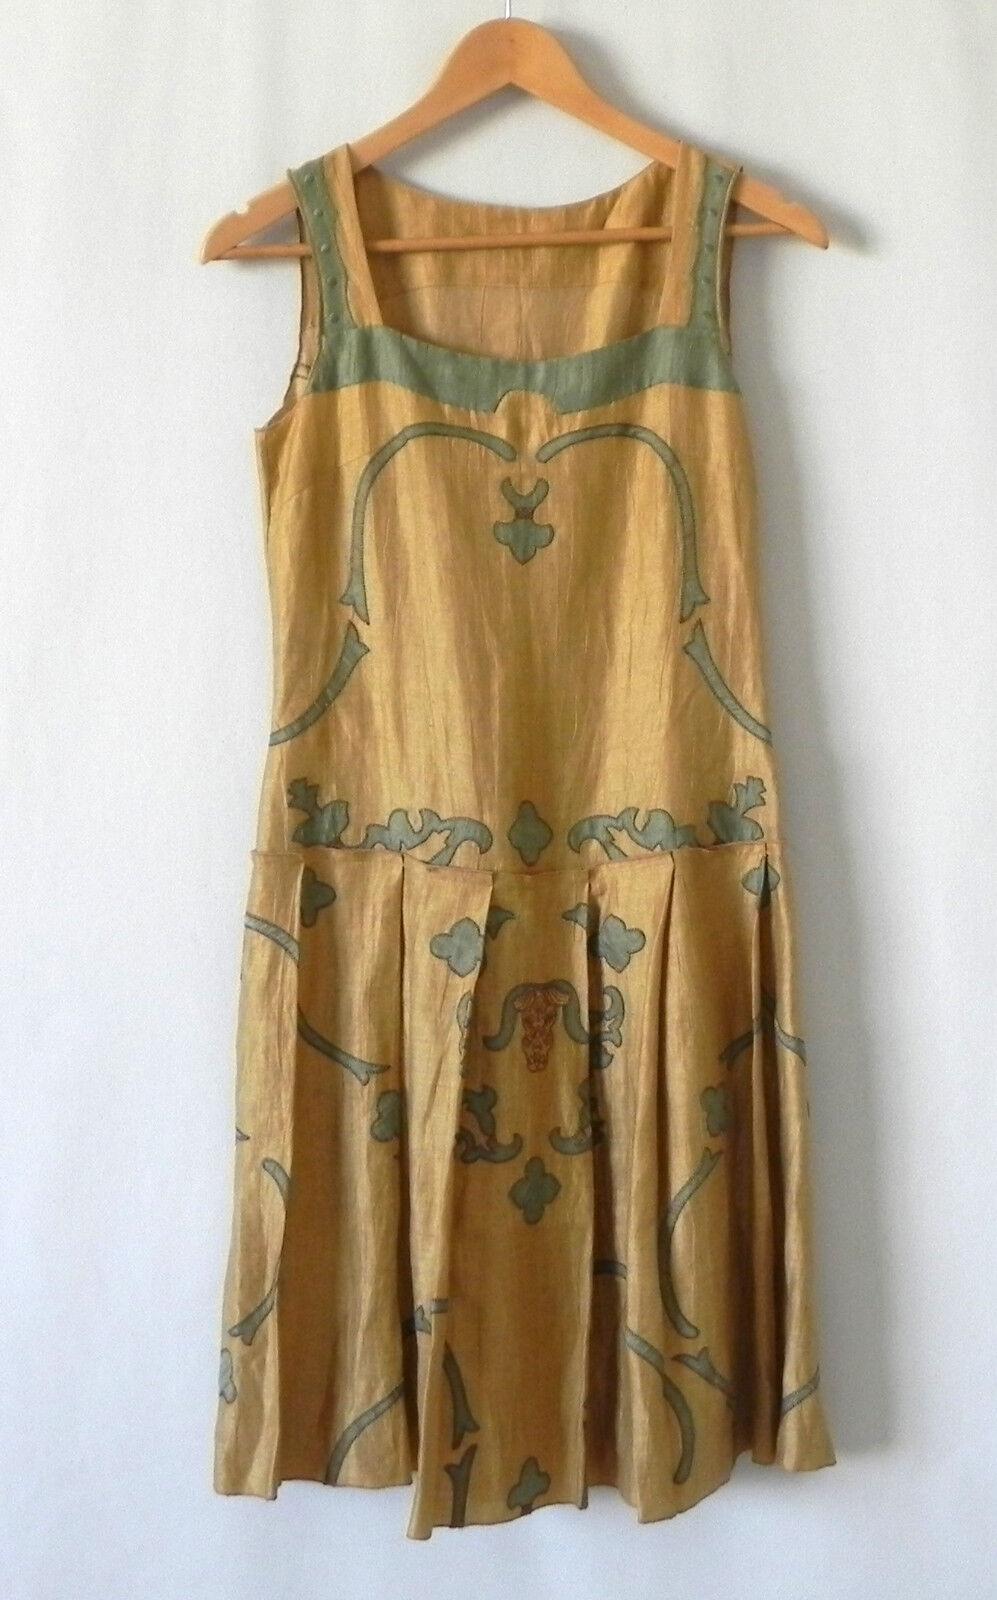 Tefen Frankie Dress Sleeveless Flax Blend Drop Waist Multi-color Size 4